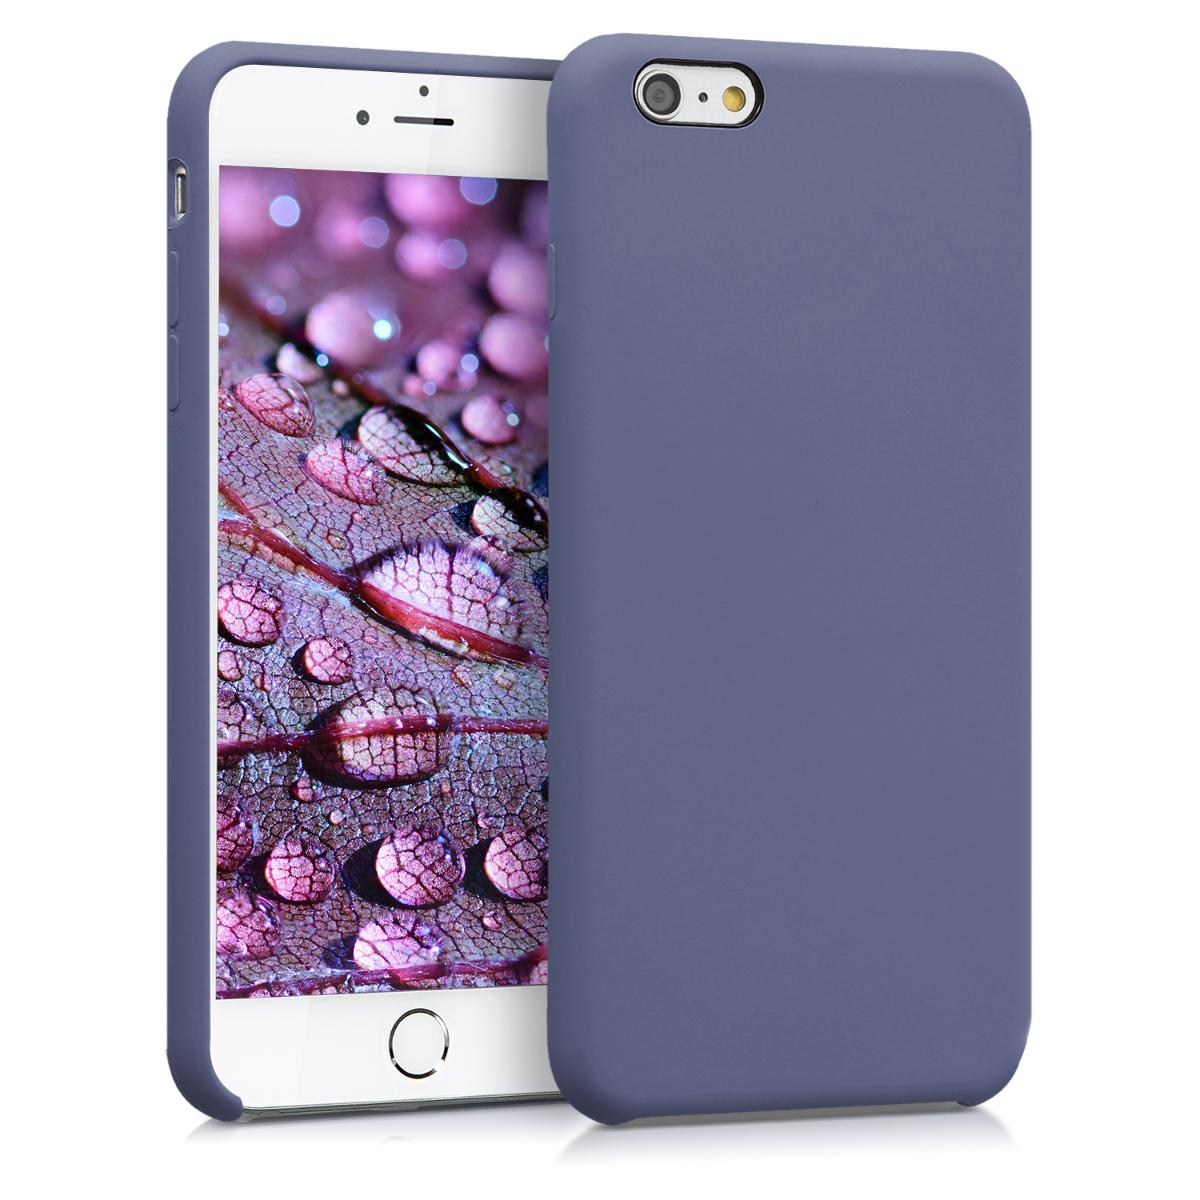 Kvalitní silikonové TPU pouzdro pro Apple iPhone 6 Plus / 6S - Lavender Gray